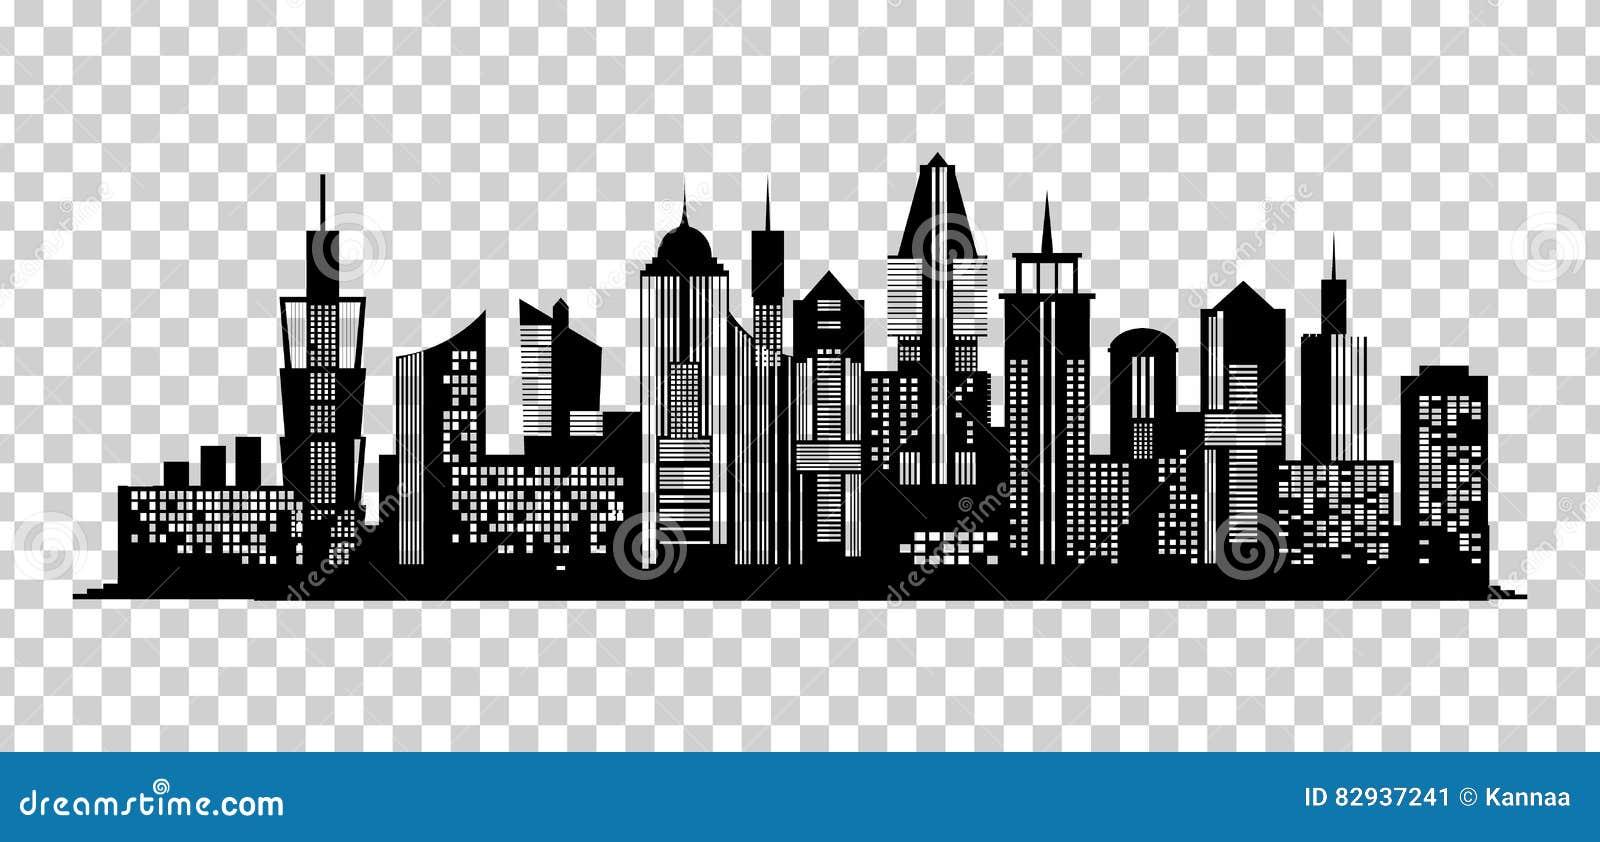 Town Landscape Vector Illustration: Cityscape Black Icon On Transparent Background Stock